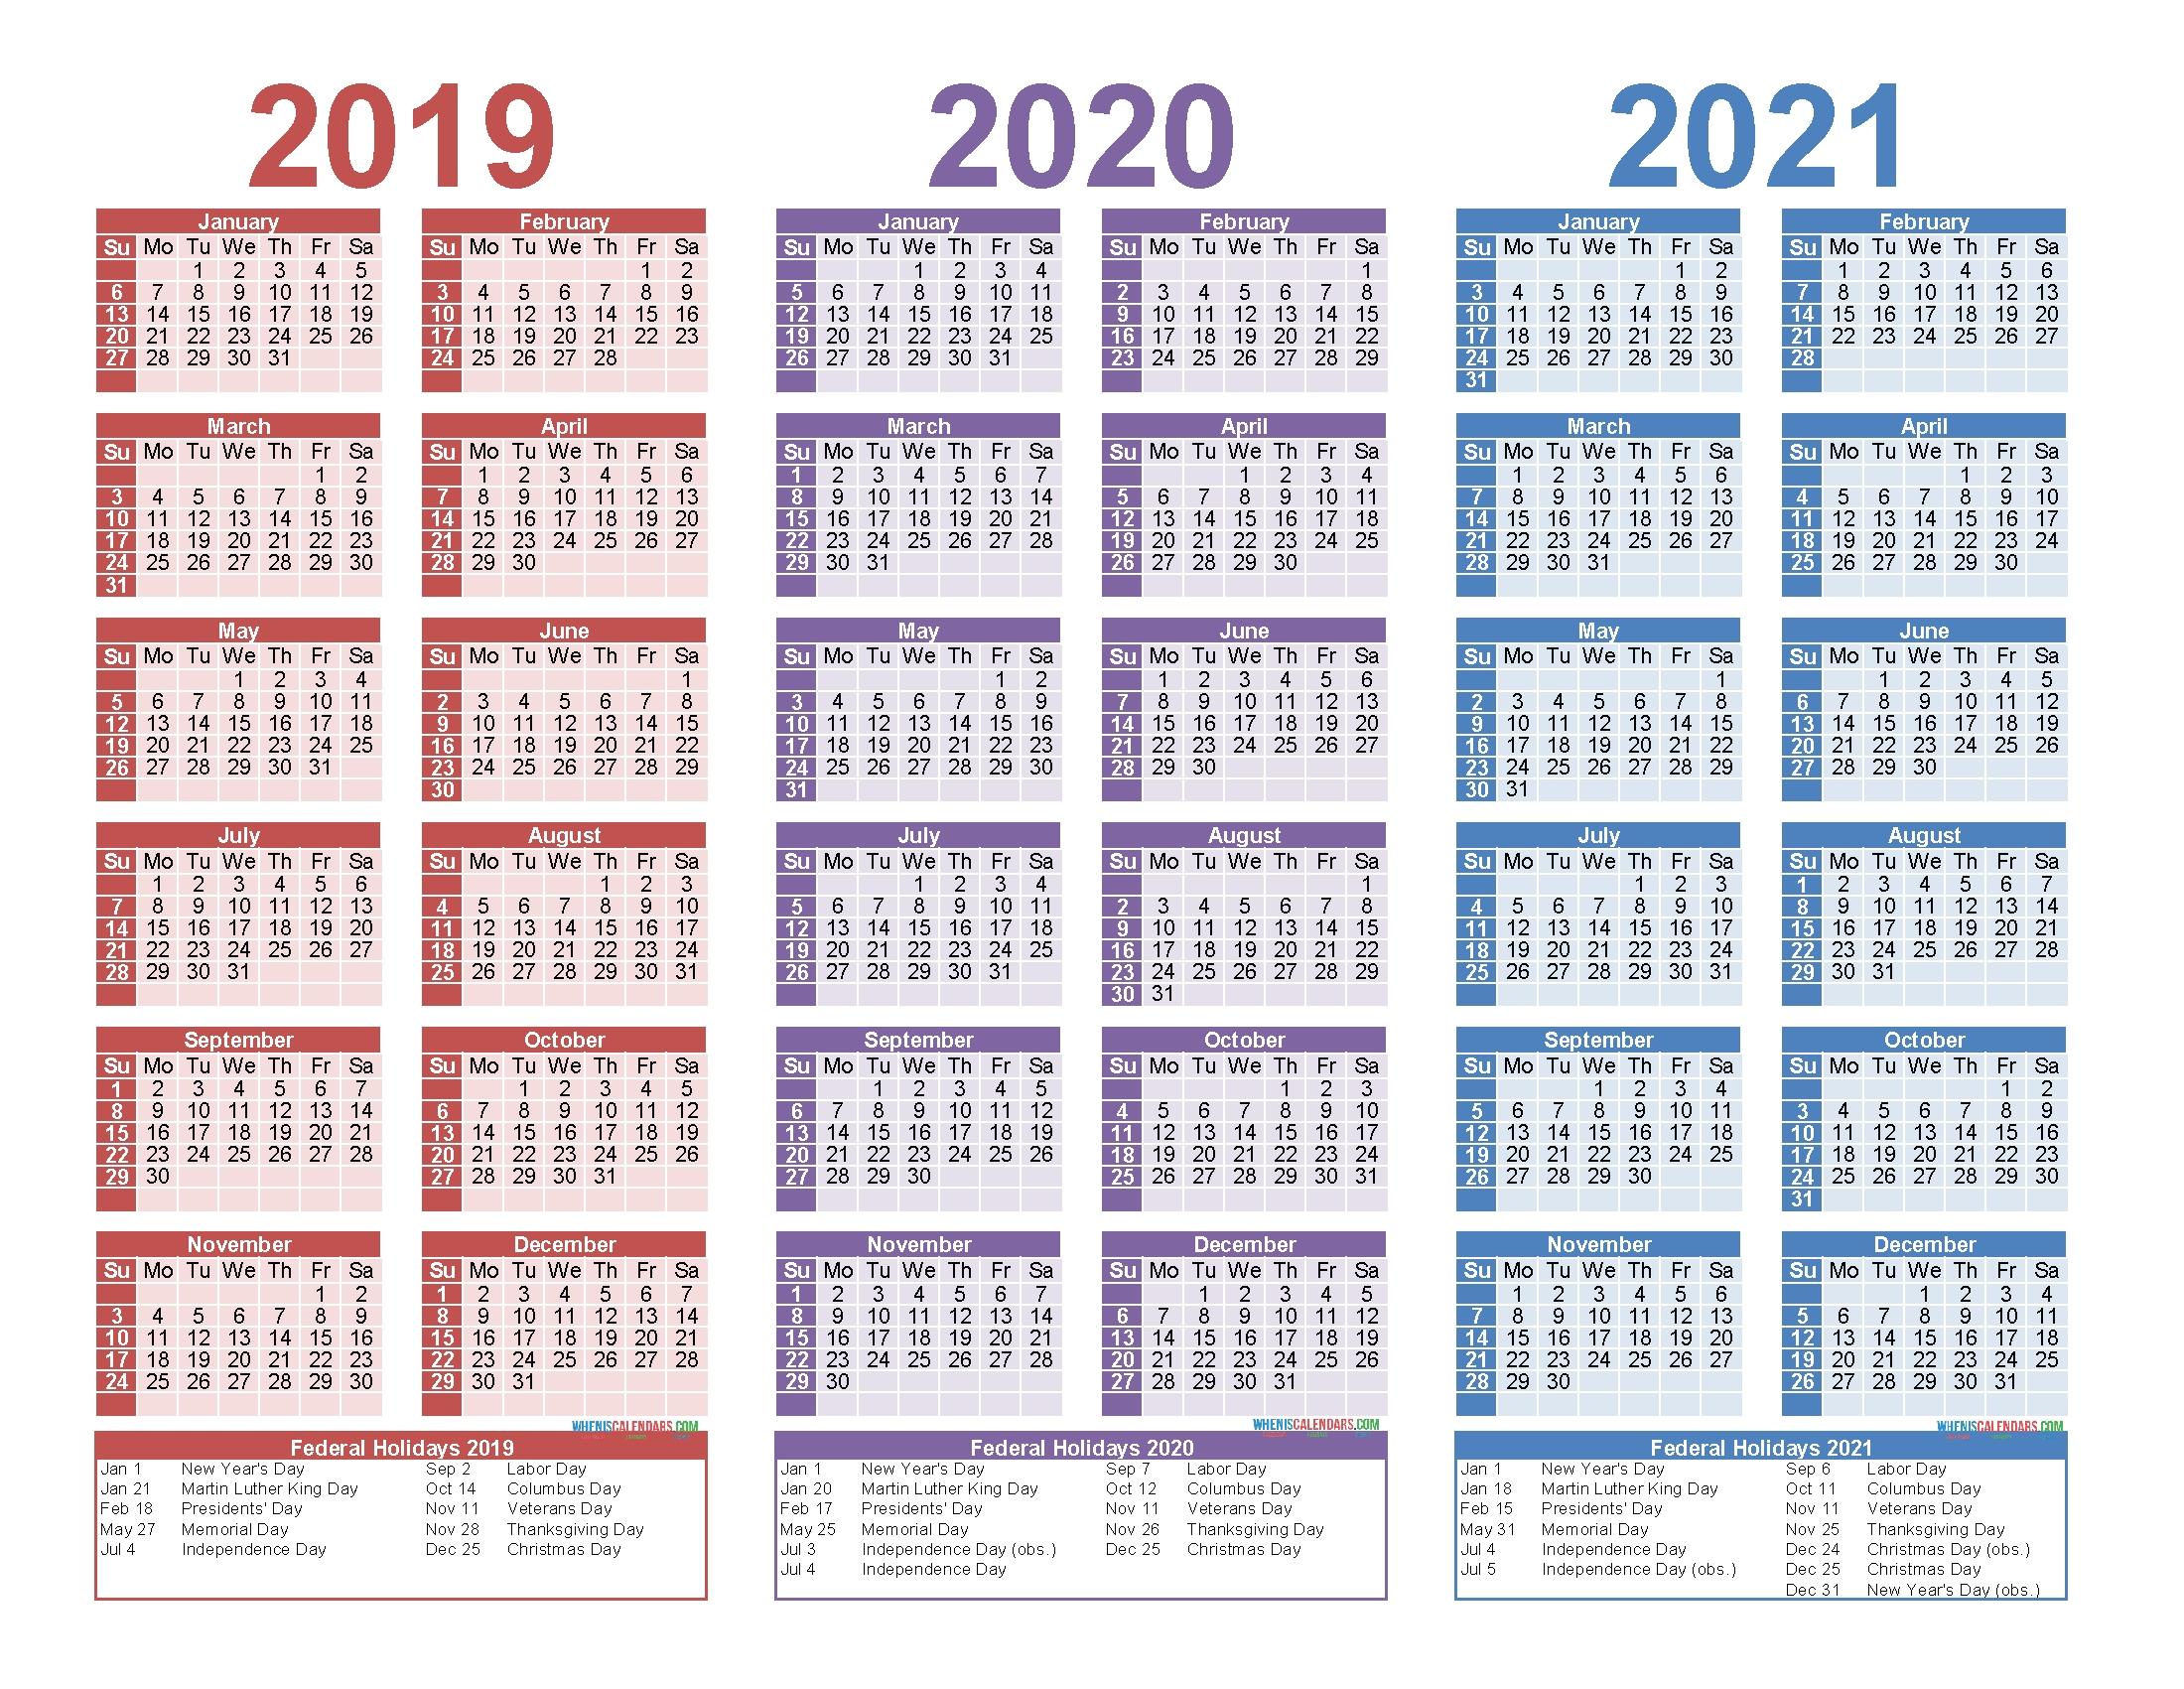 Free Printable 2019 2020 2021 Calendar With Holidays – Free